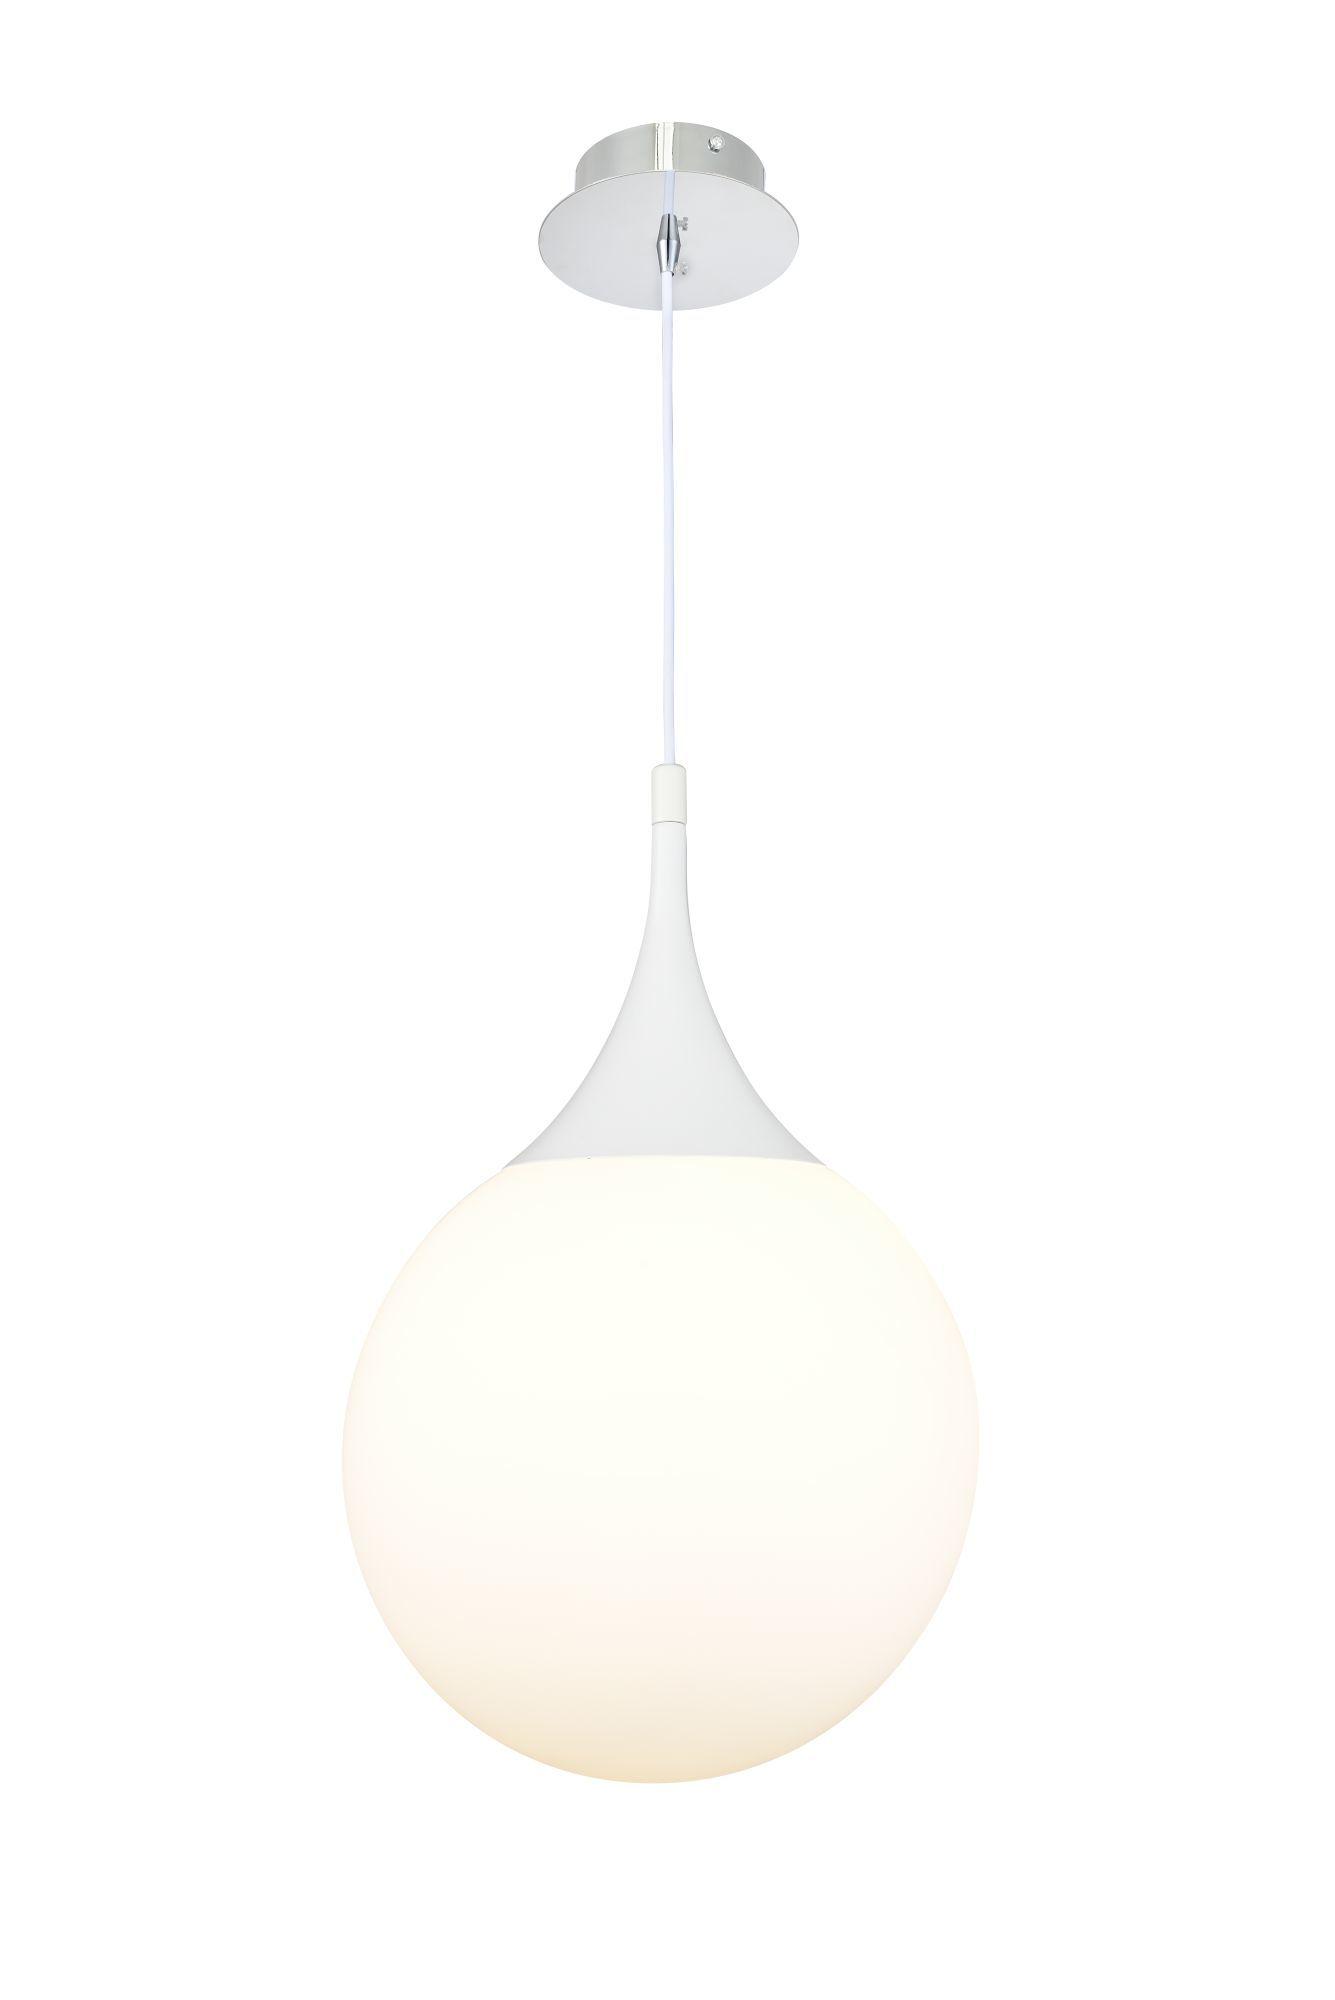 Подвесной светильник Maytoni Modern Dewdrop P225-PL-300-N (MOD225-30-N), 1xE27x8W, белый, металл, стекло - фото 2